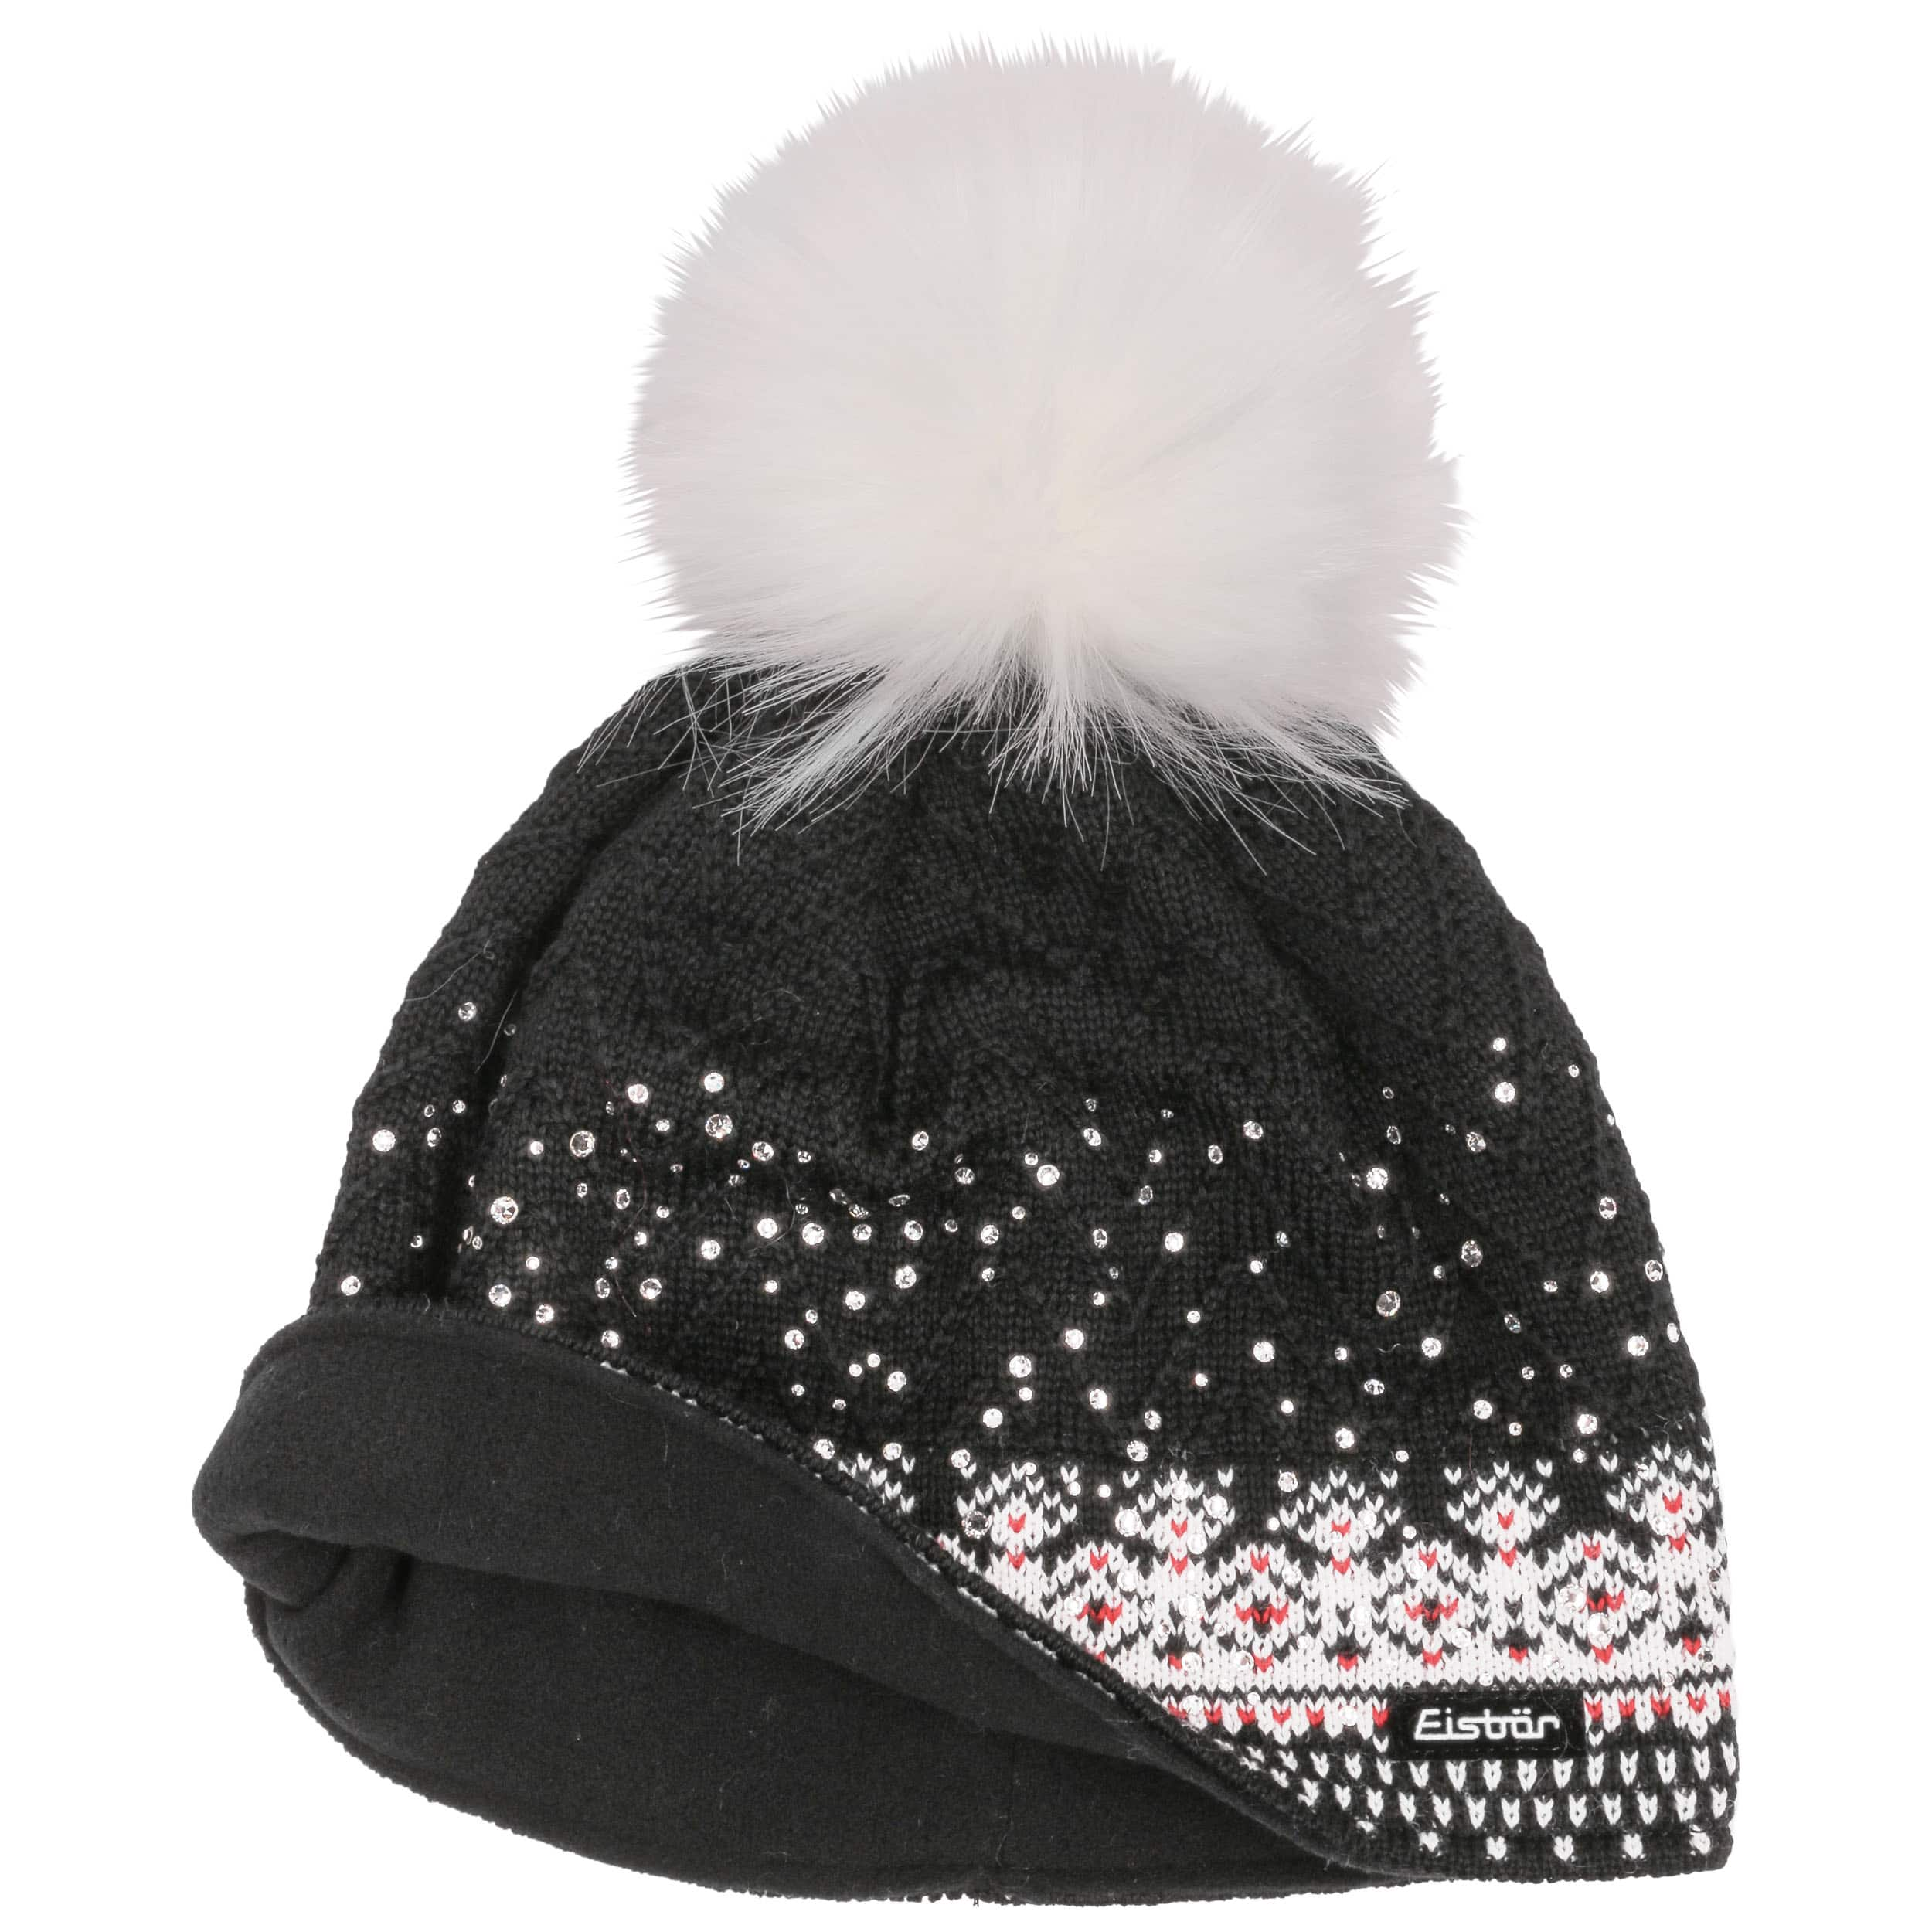 2d903704efc Connor Pompom Hat by Eisbär - black 1 ...